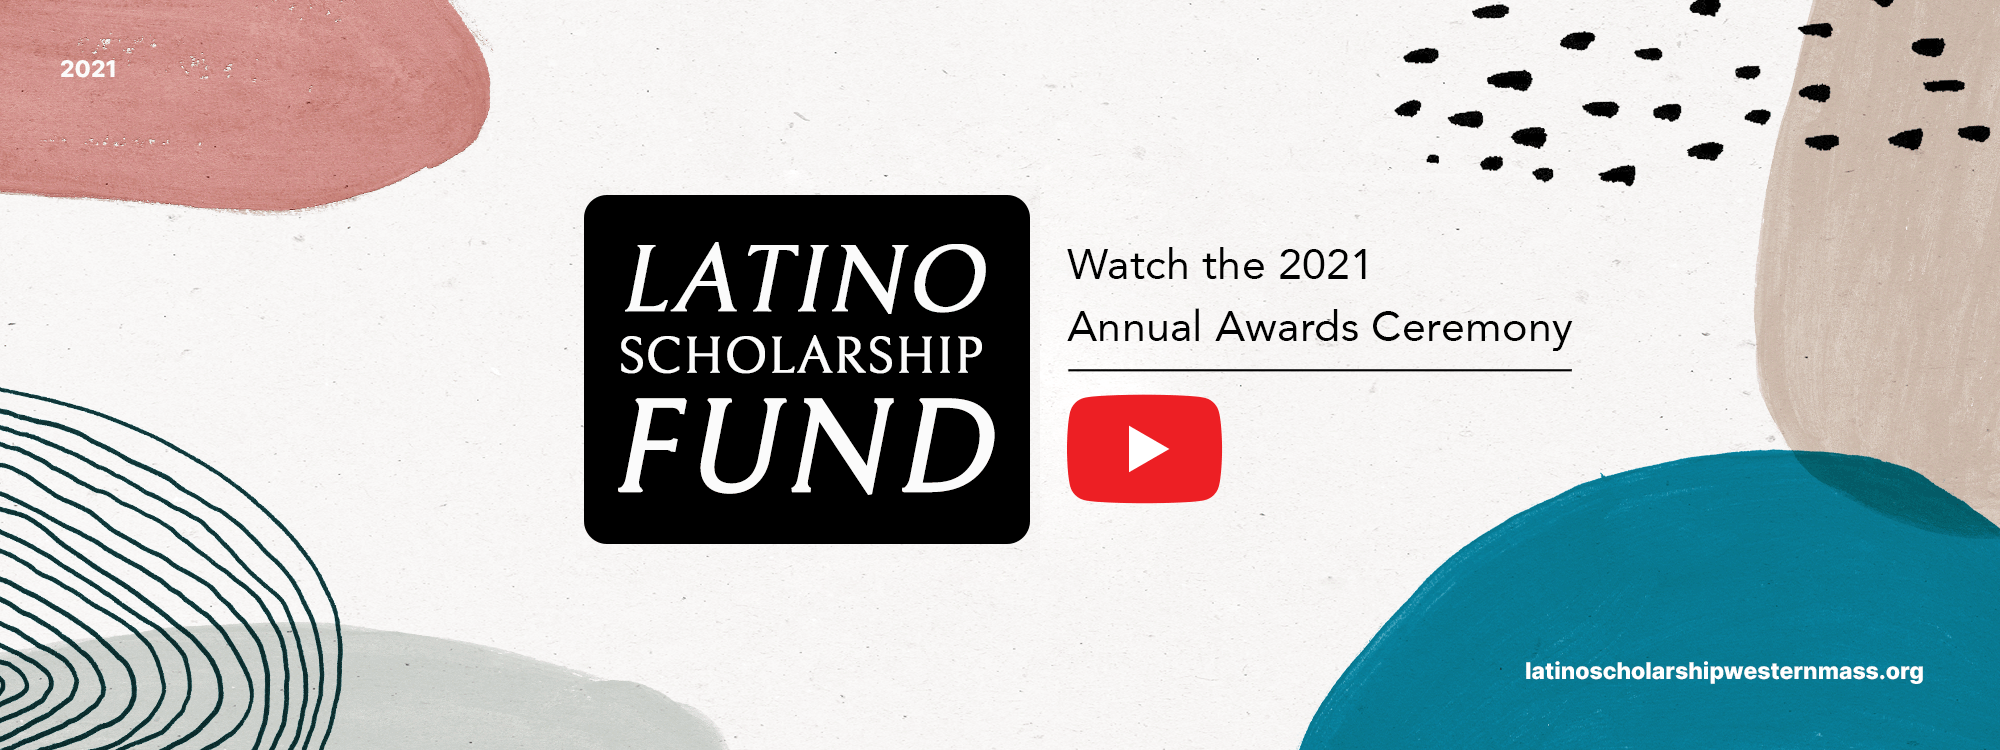 Watch the Latino Scholarship Annual Awards Ceremony